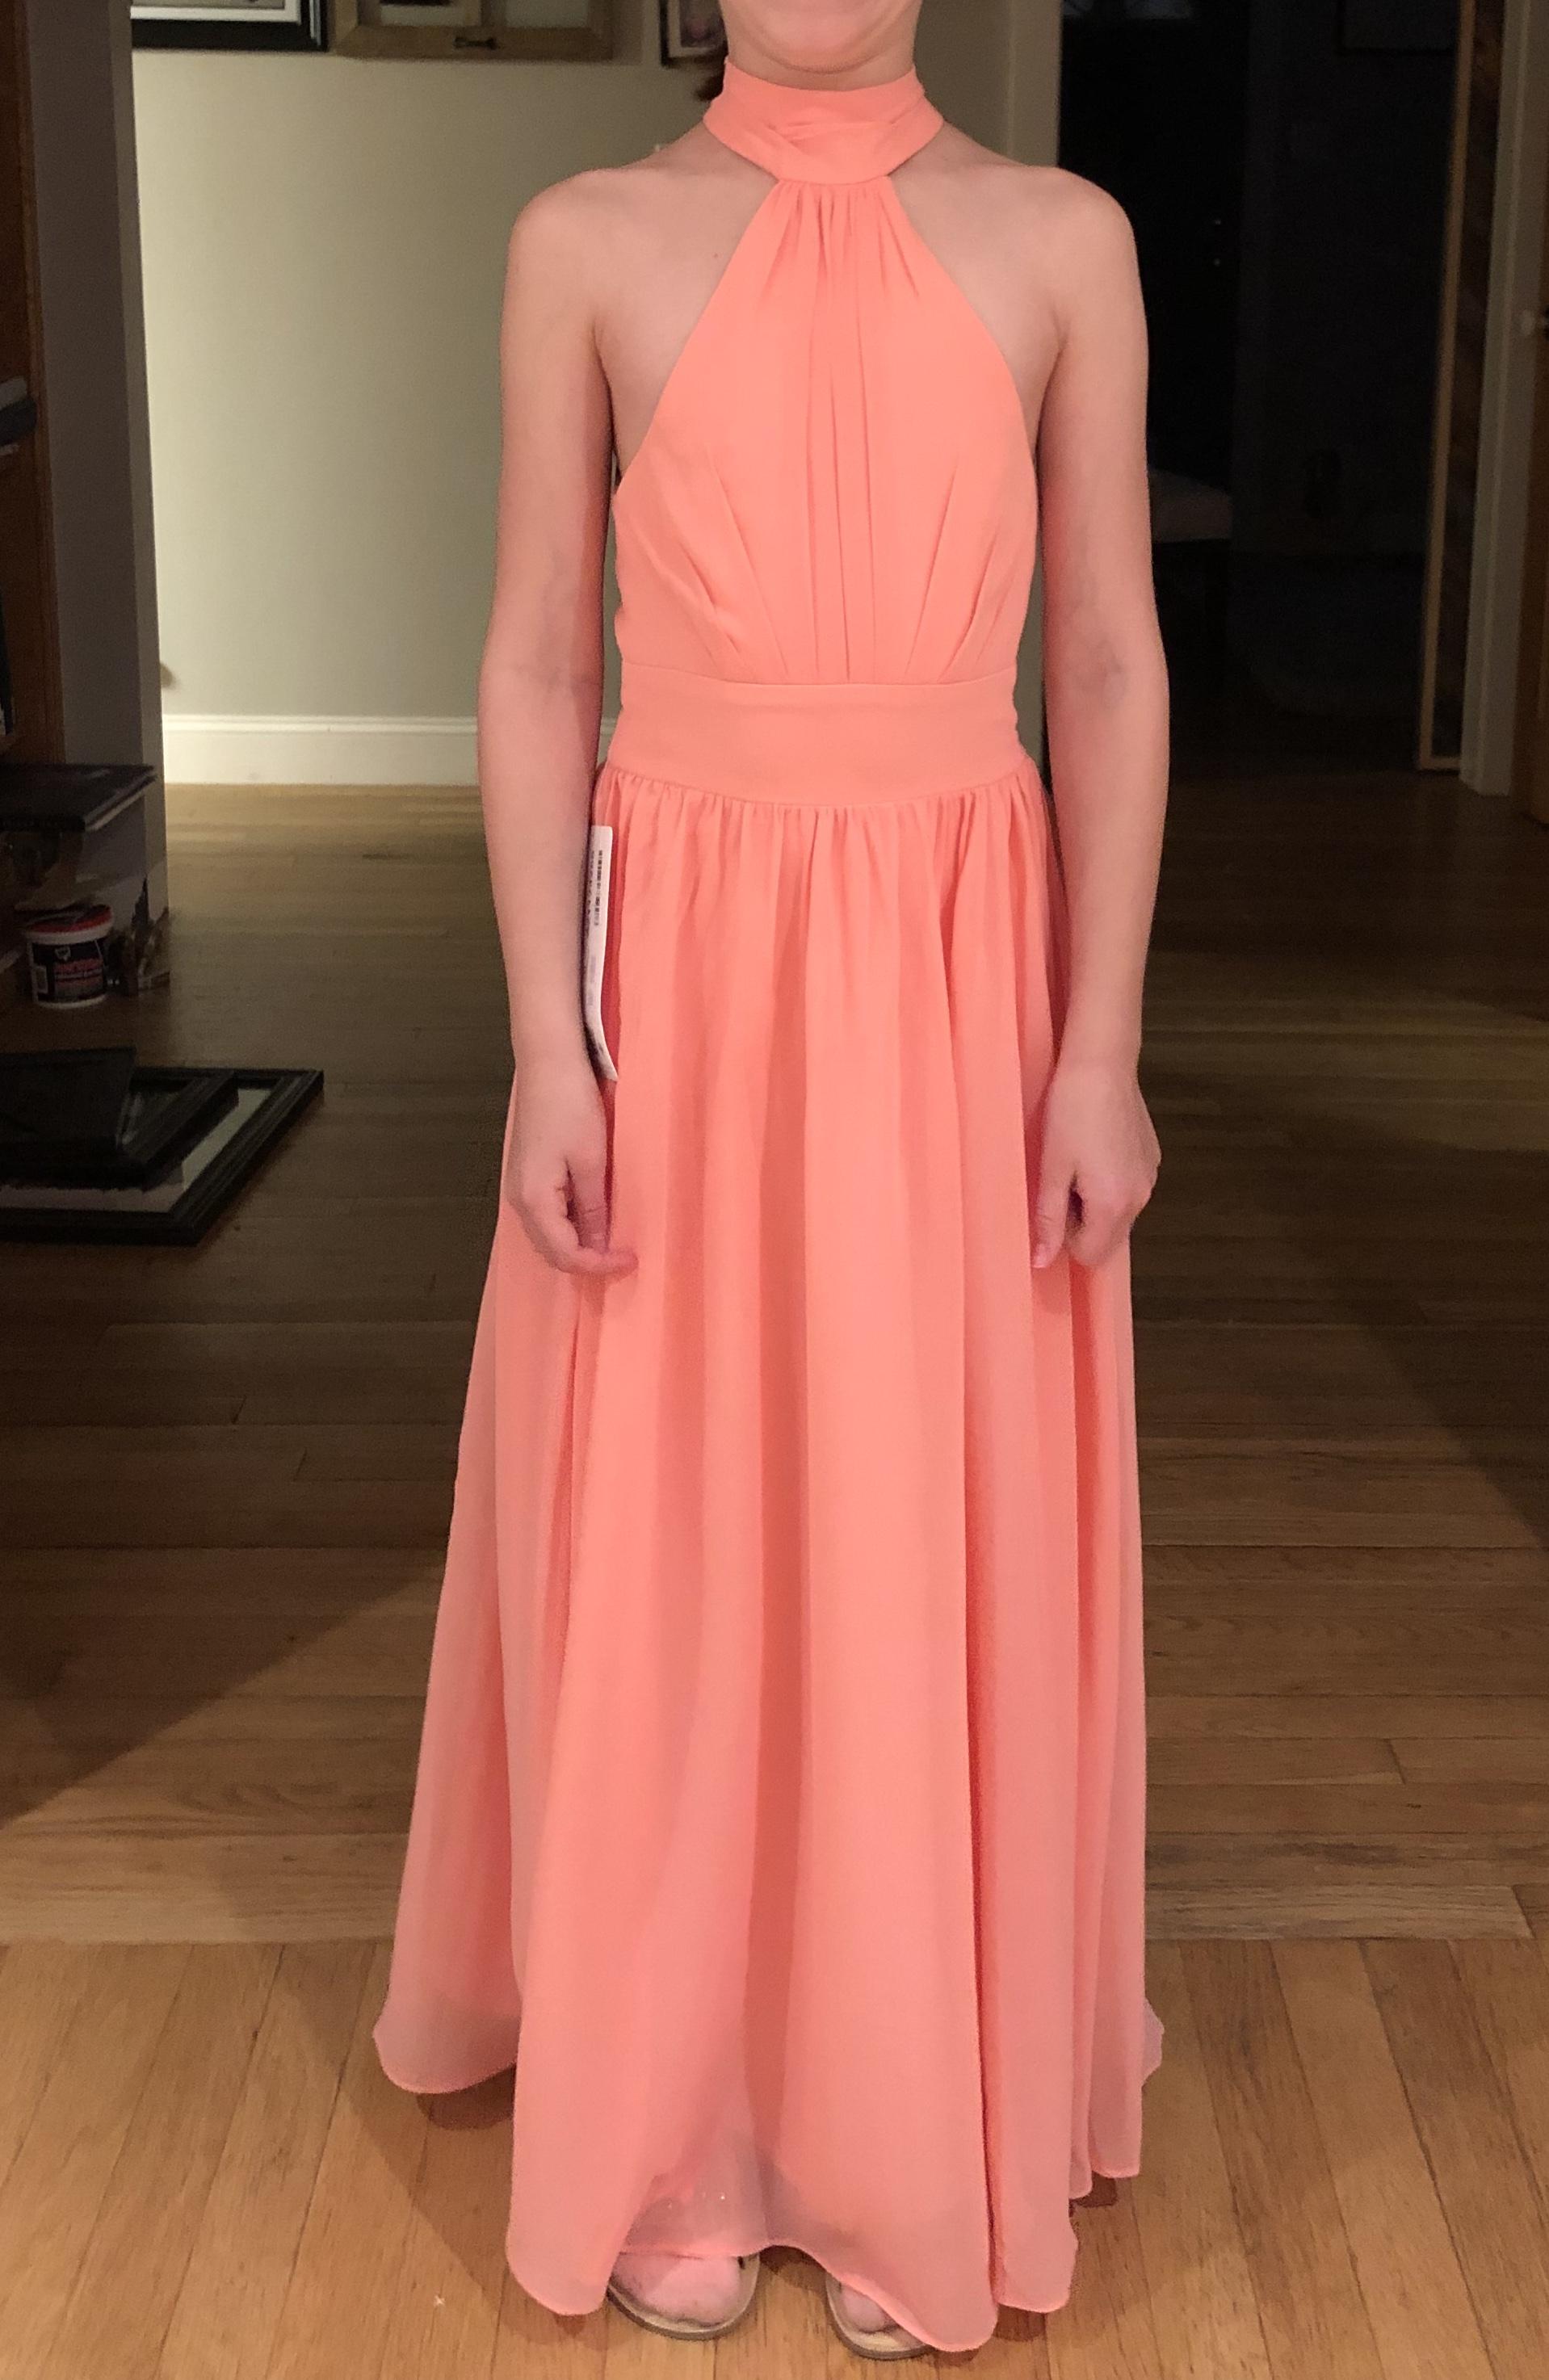 cc240e247a7 27 Dresses Prom Dress Review - Data Dynamic AG